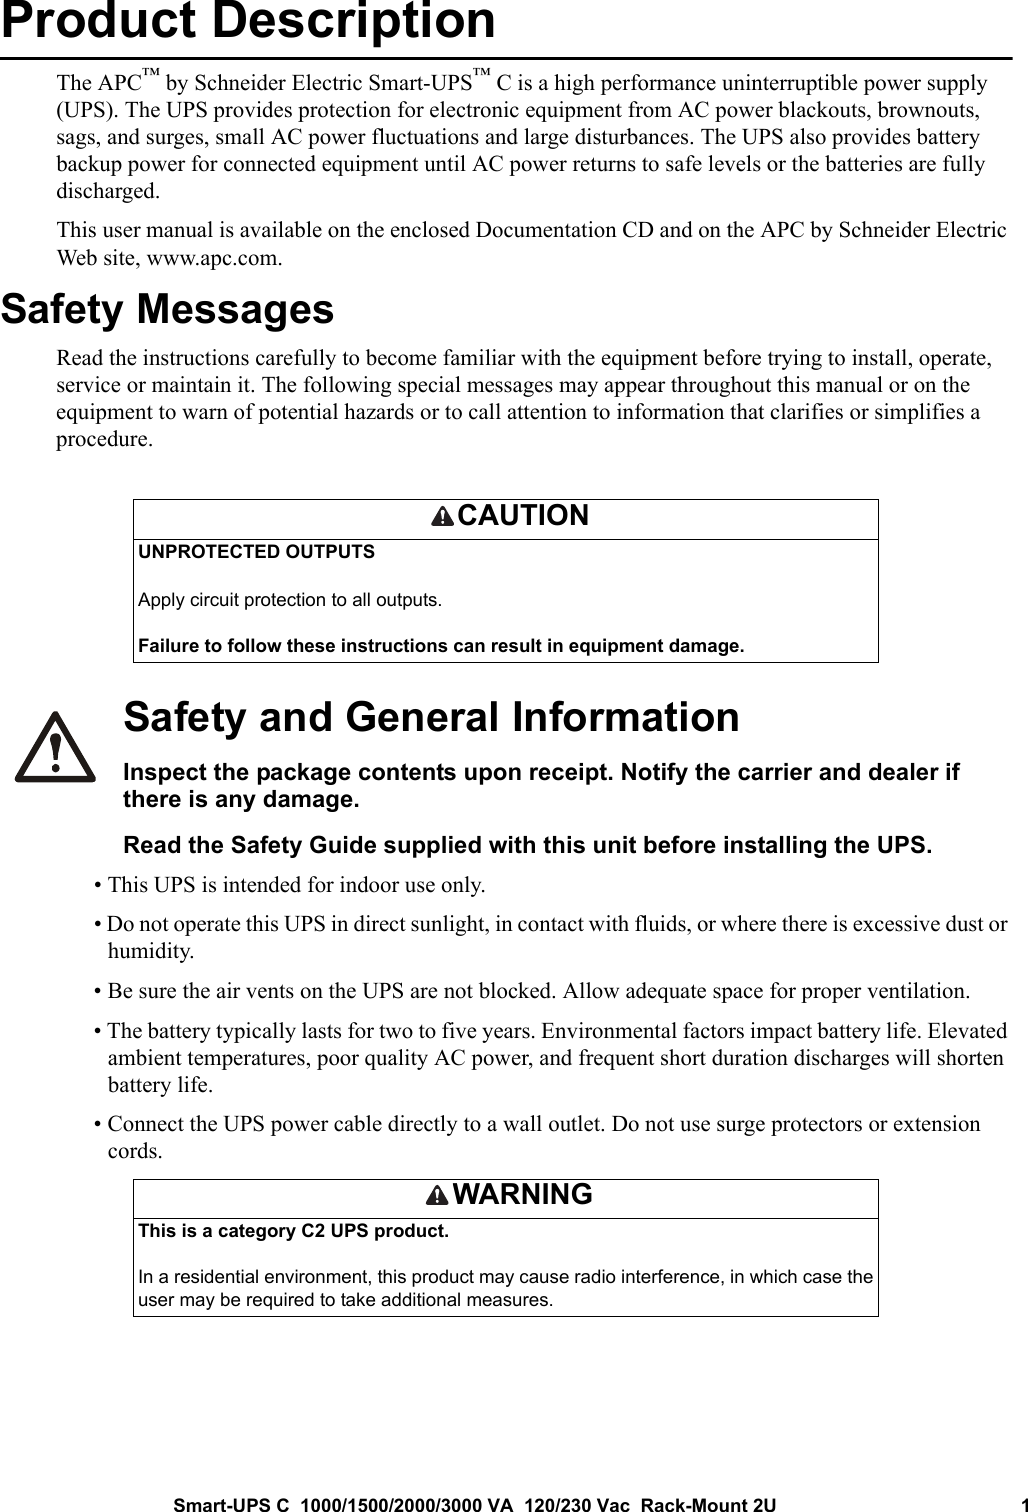 Apc Smc10002U Users Manual SU UM 990 5198 FC EN